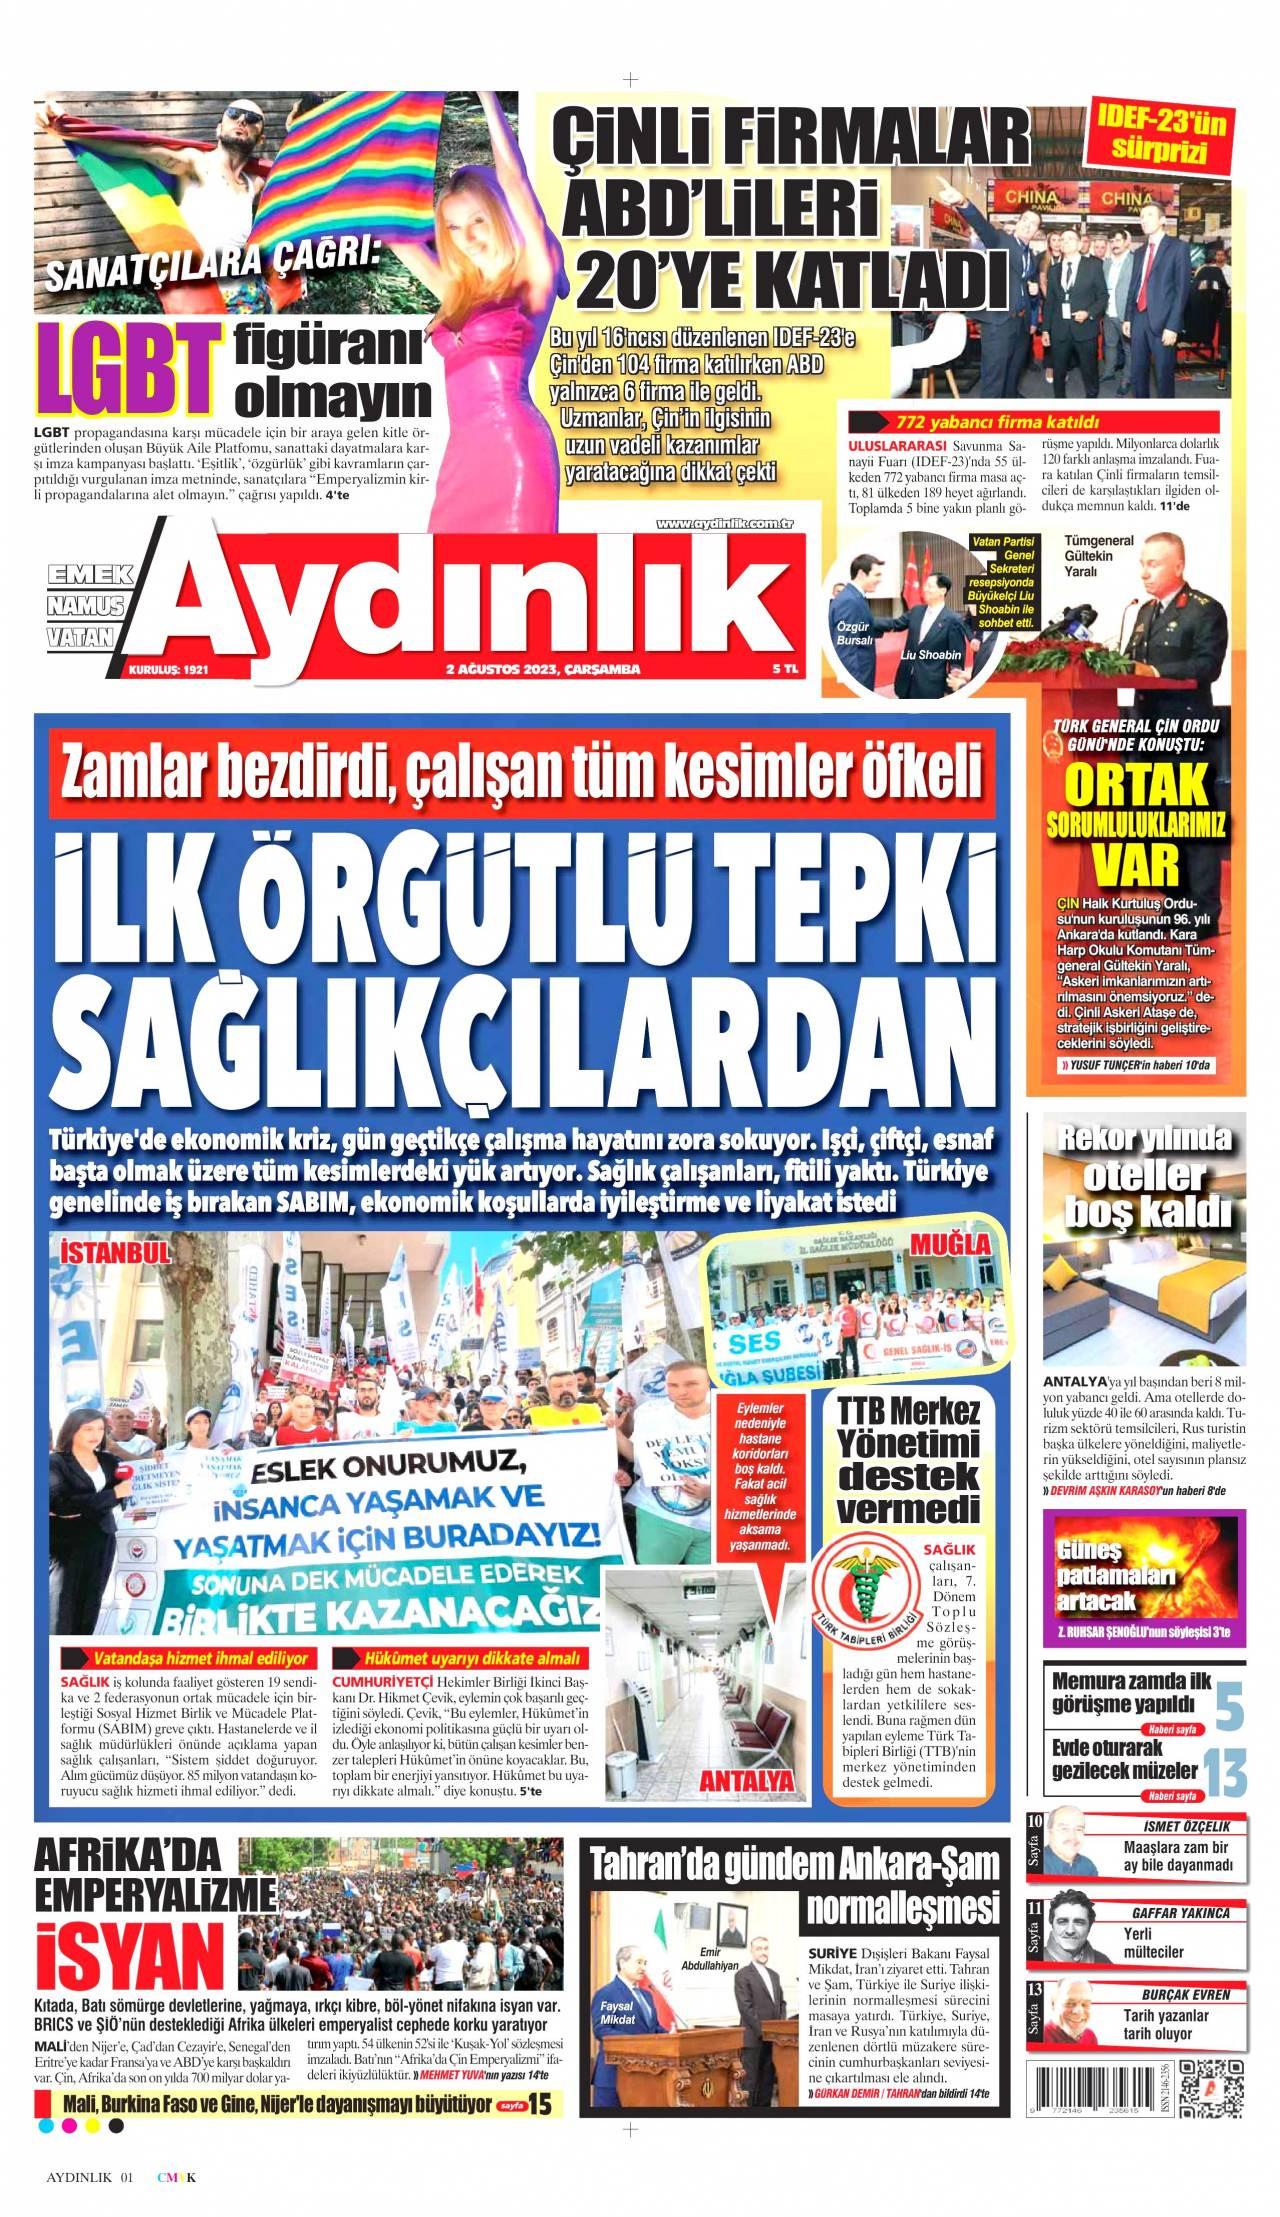 19 Eylül 2019, Perşembe aydinlik Gazetesi